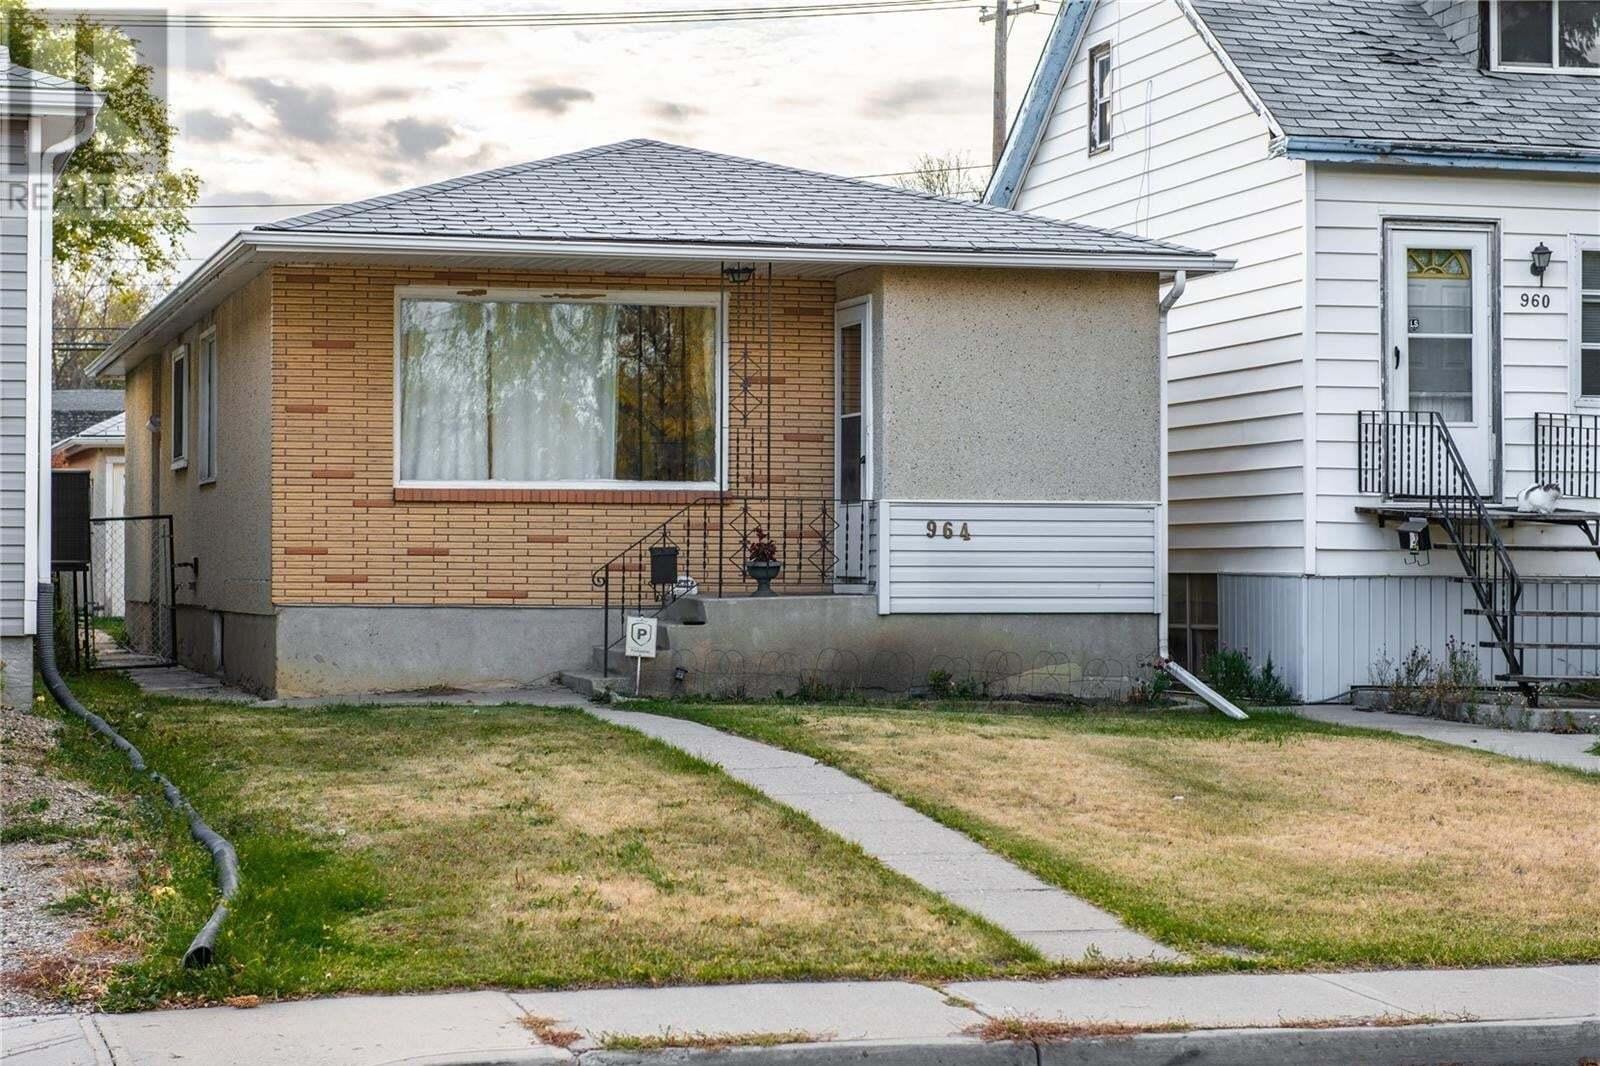 House for sale at 964 Princess St Regina Saskatchewan - MLS: SK830178